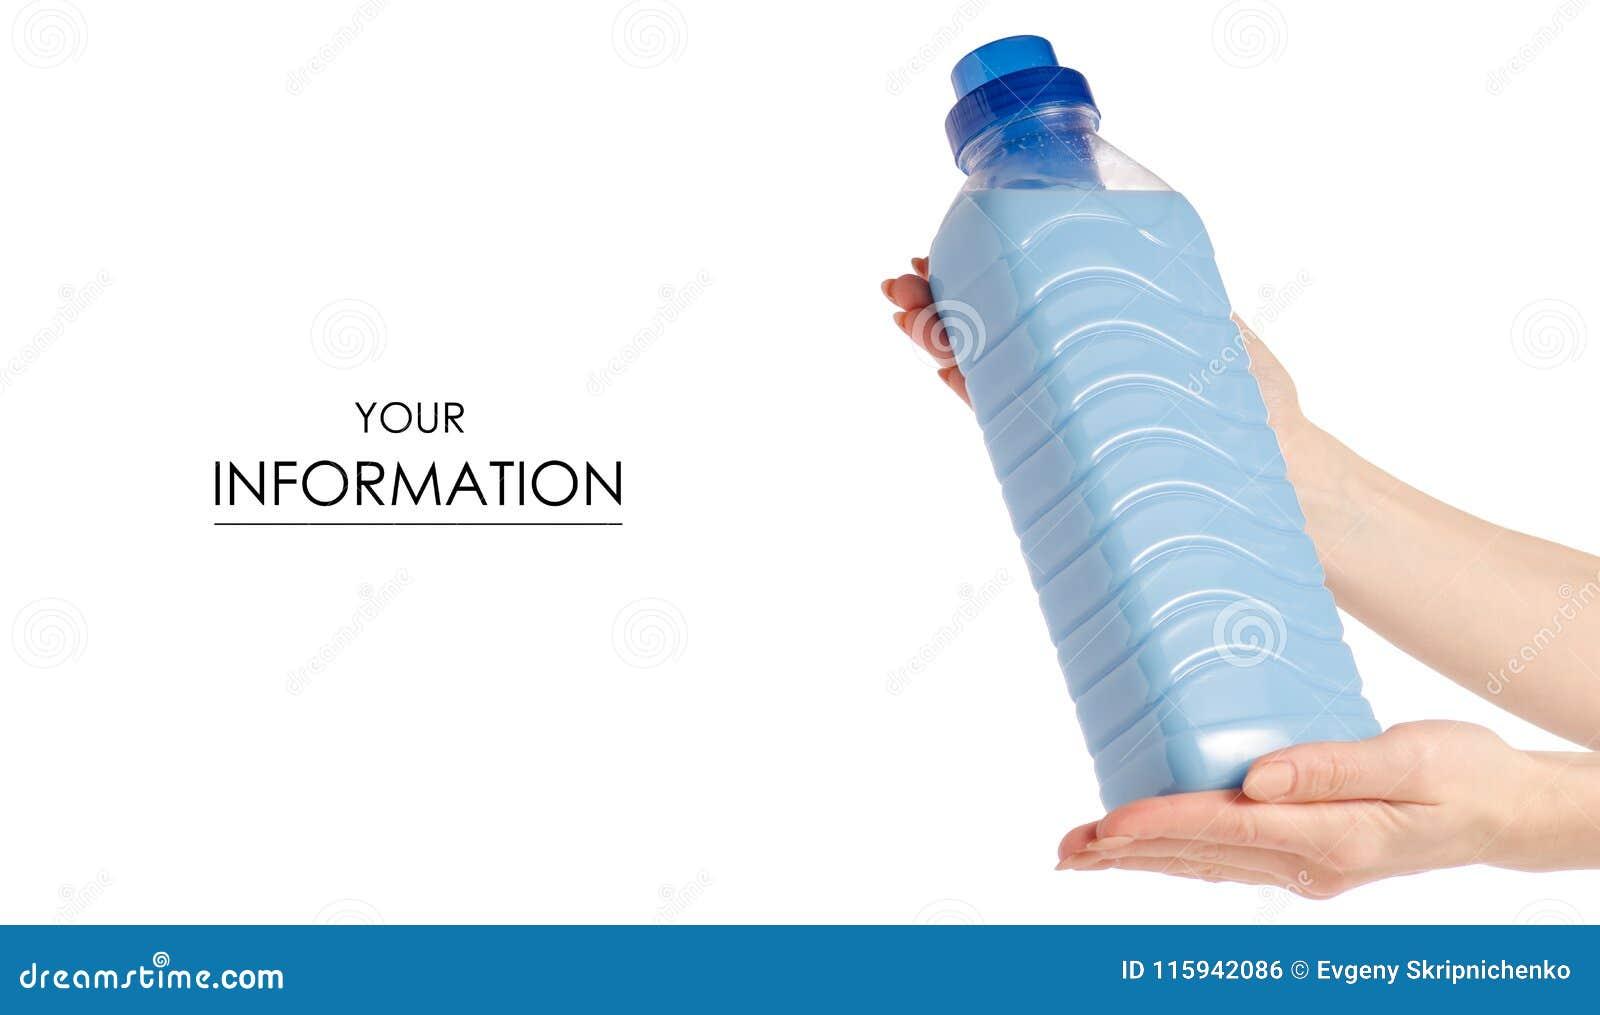 Softener Conditioner In Blue Plastic Bottle In Hand Pattern